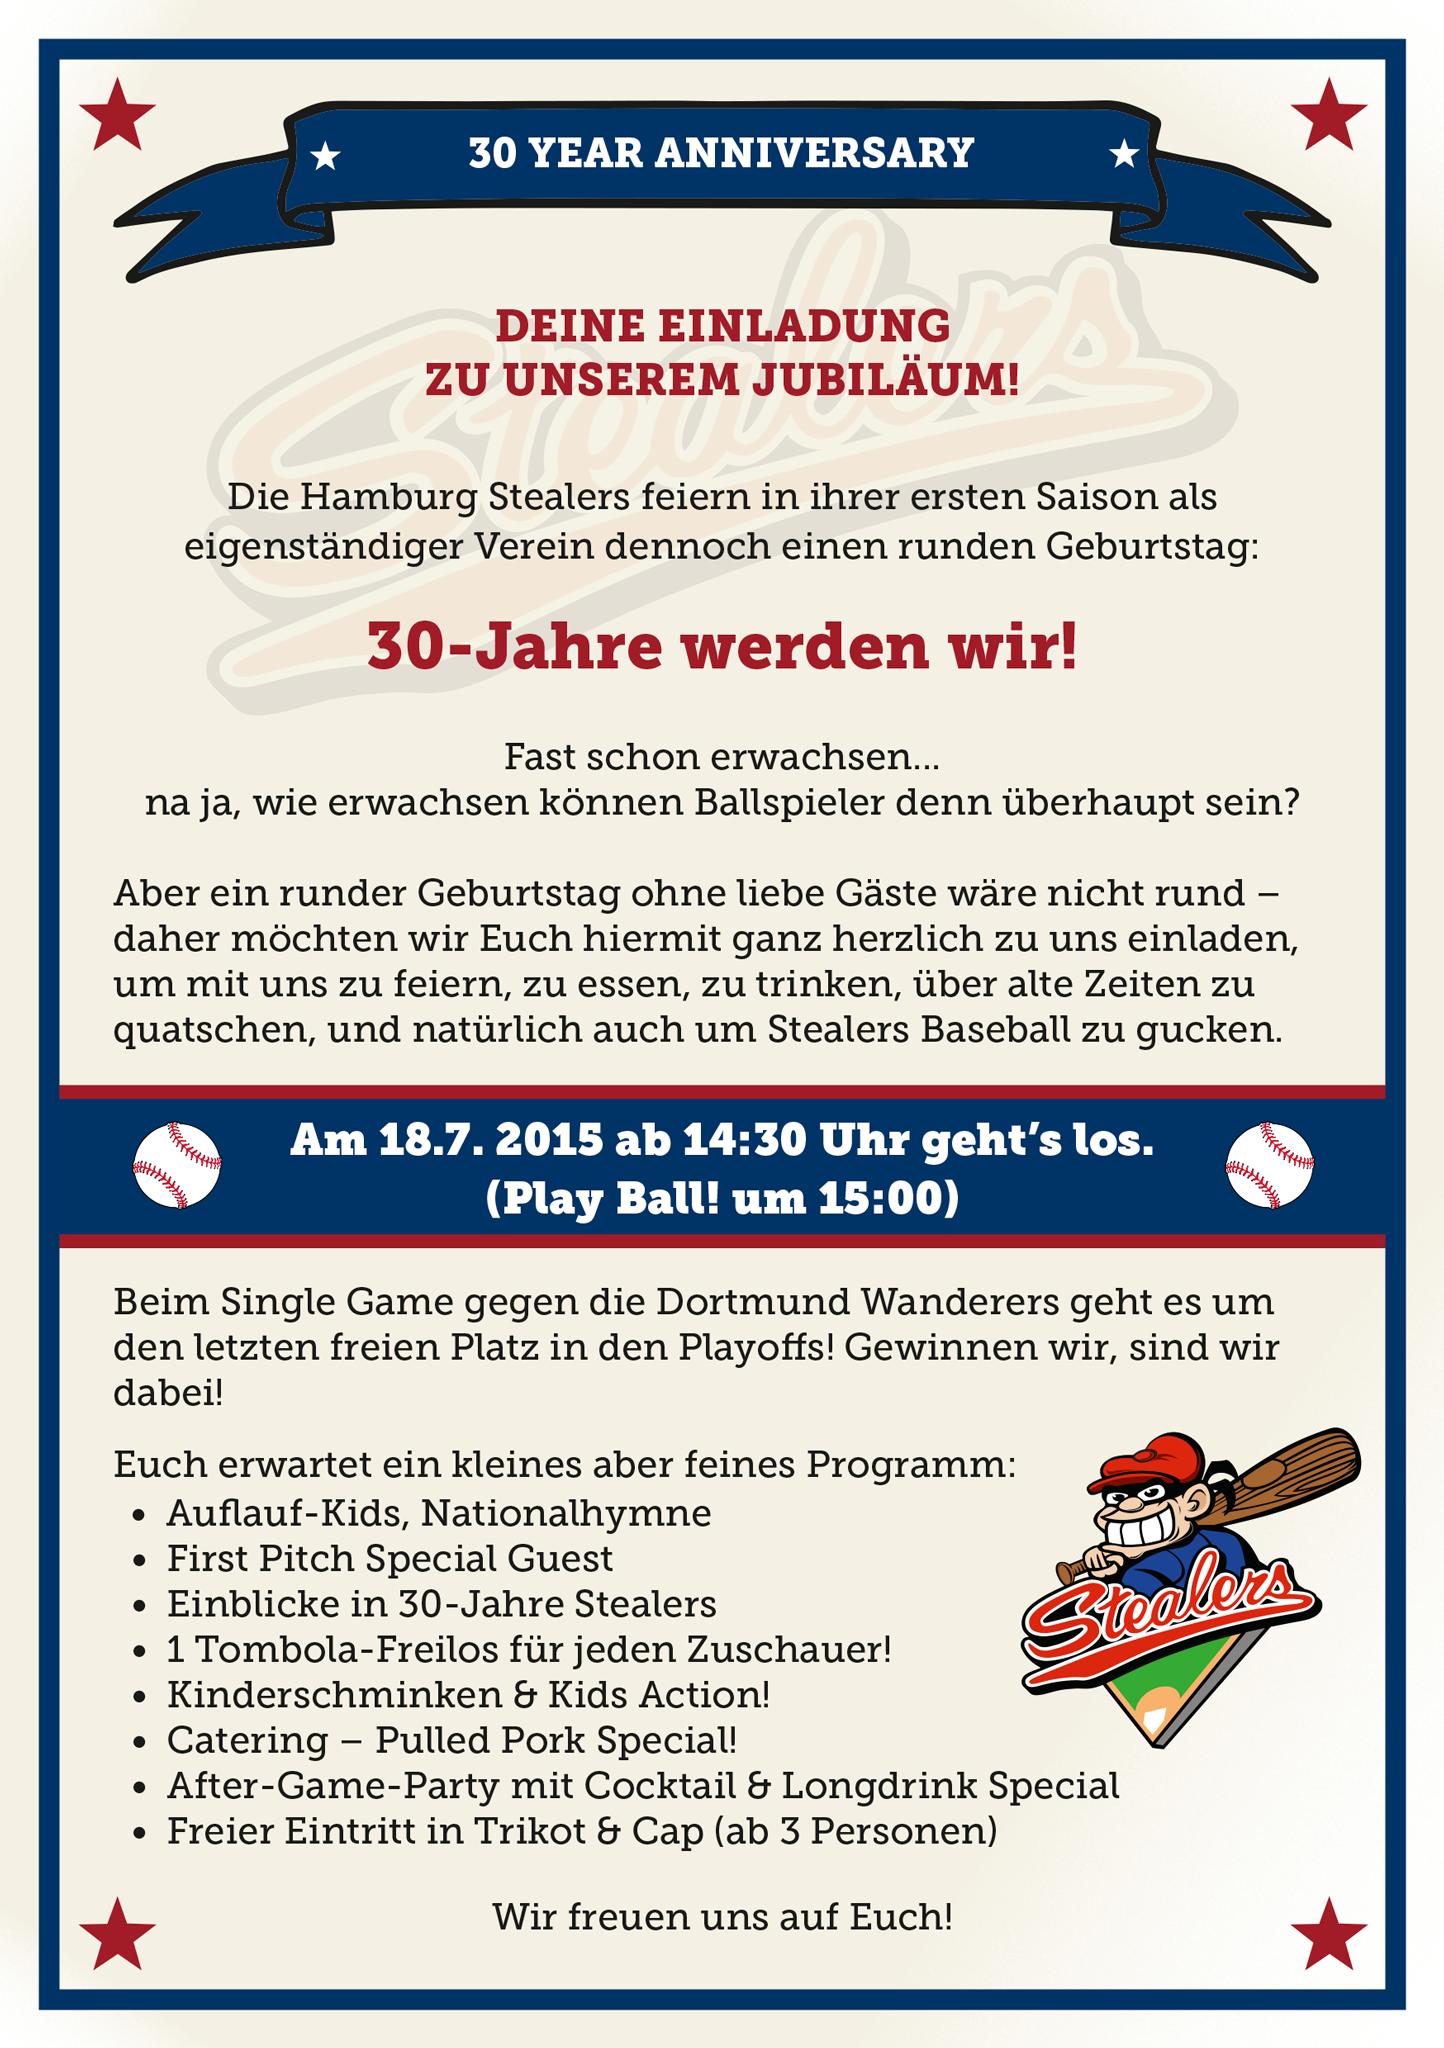 baseballclub hamburg stealers e.v. » stealers feiern jubiläum und, Einladung